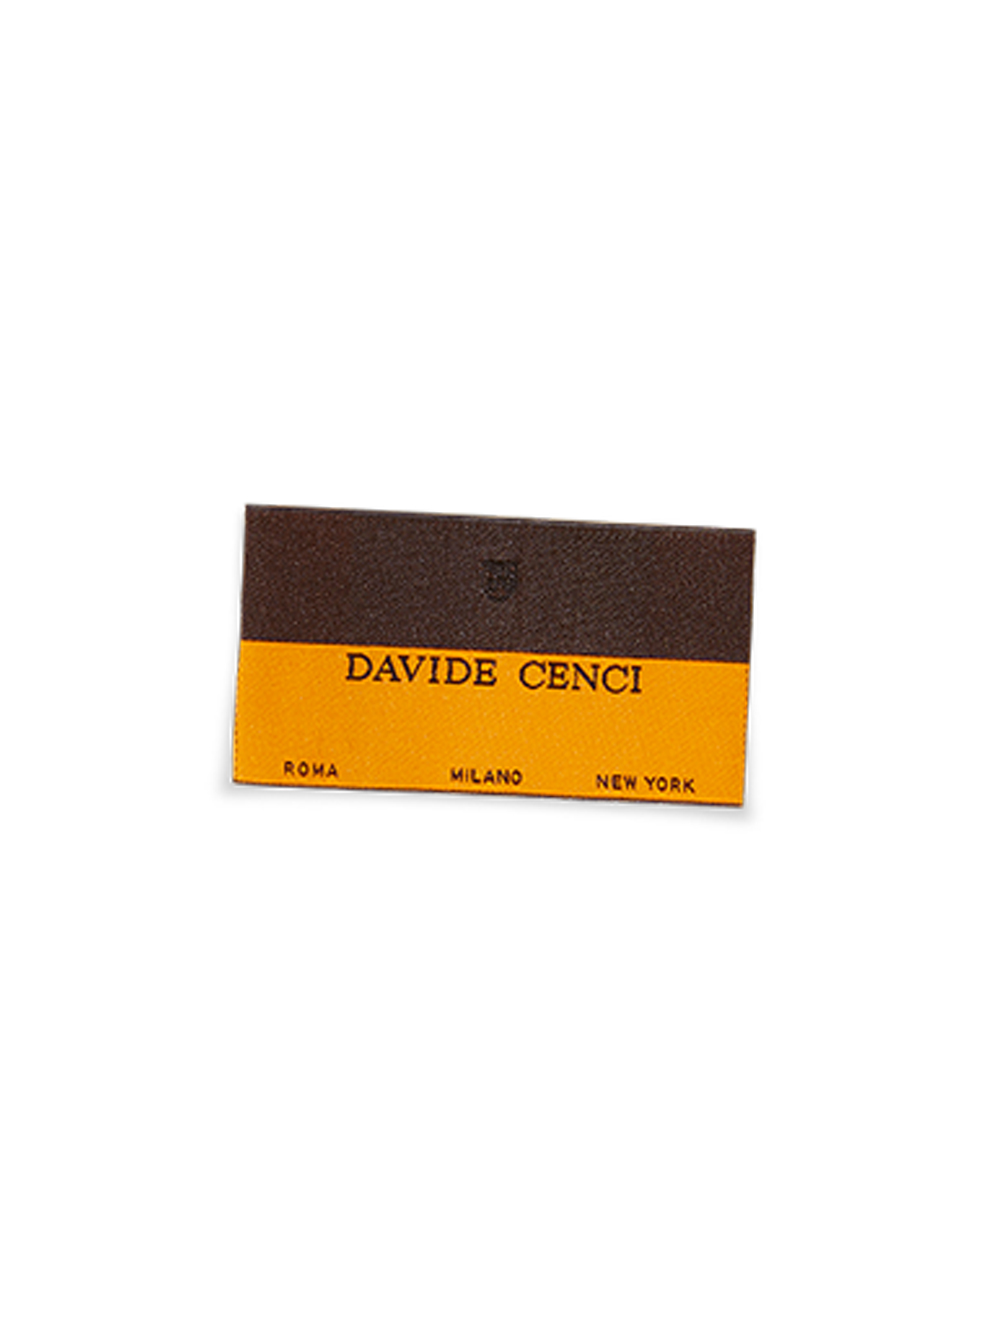 Blue silk jacquard tie Davide Cenci with white micro polka dots